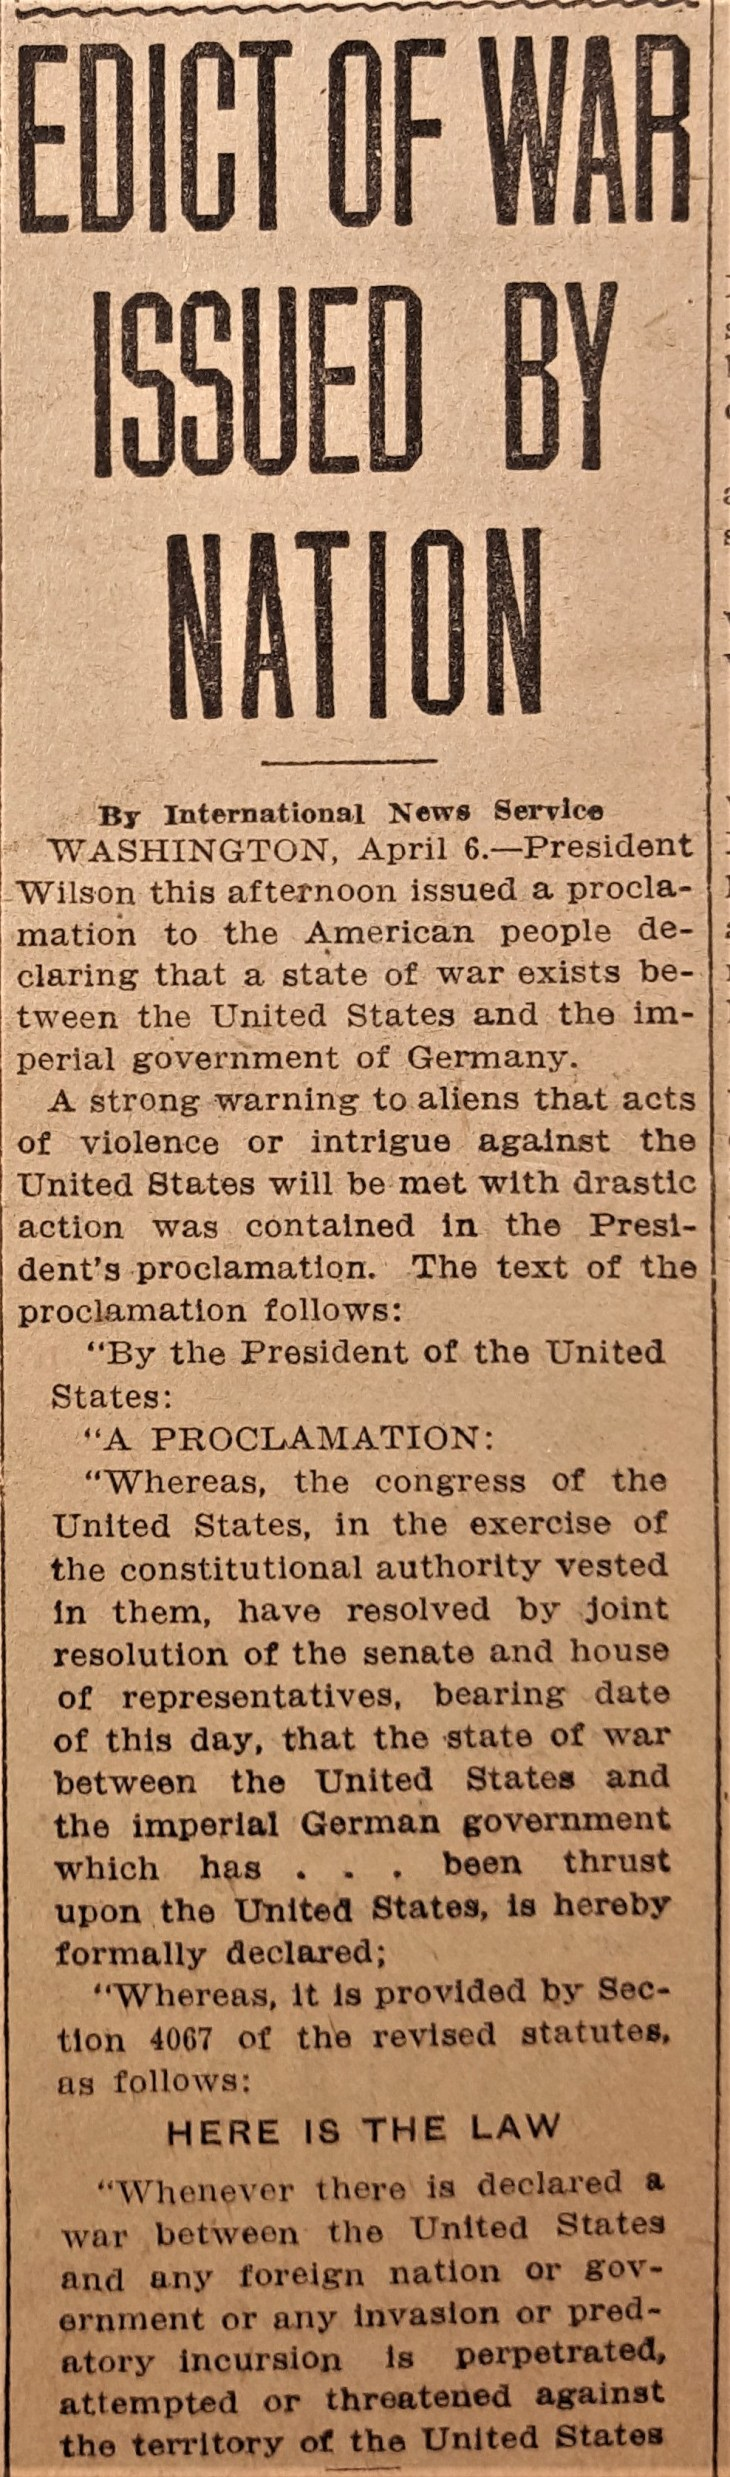 Herald War Proclamation 6Apr17